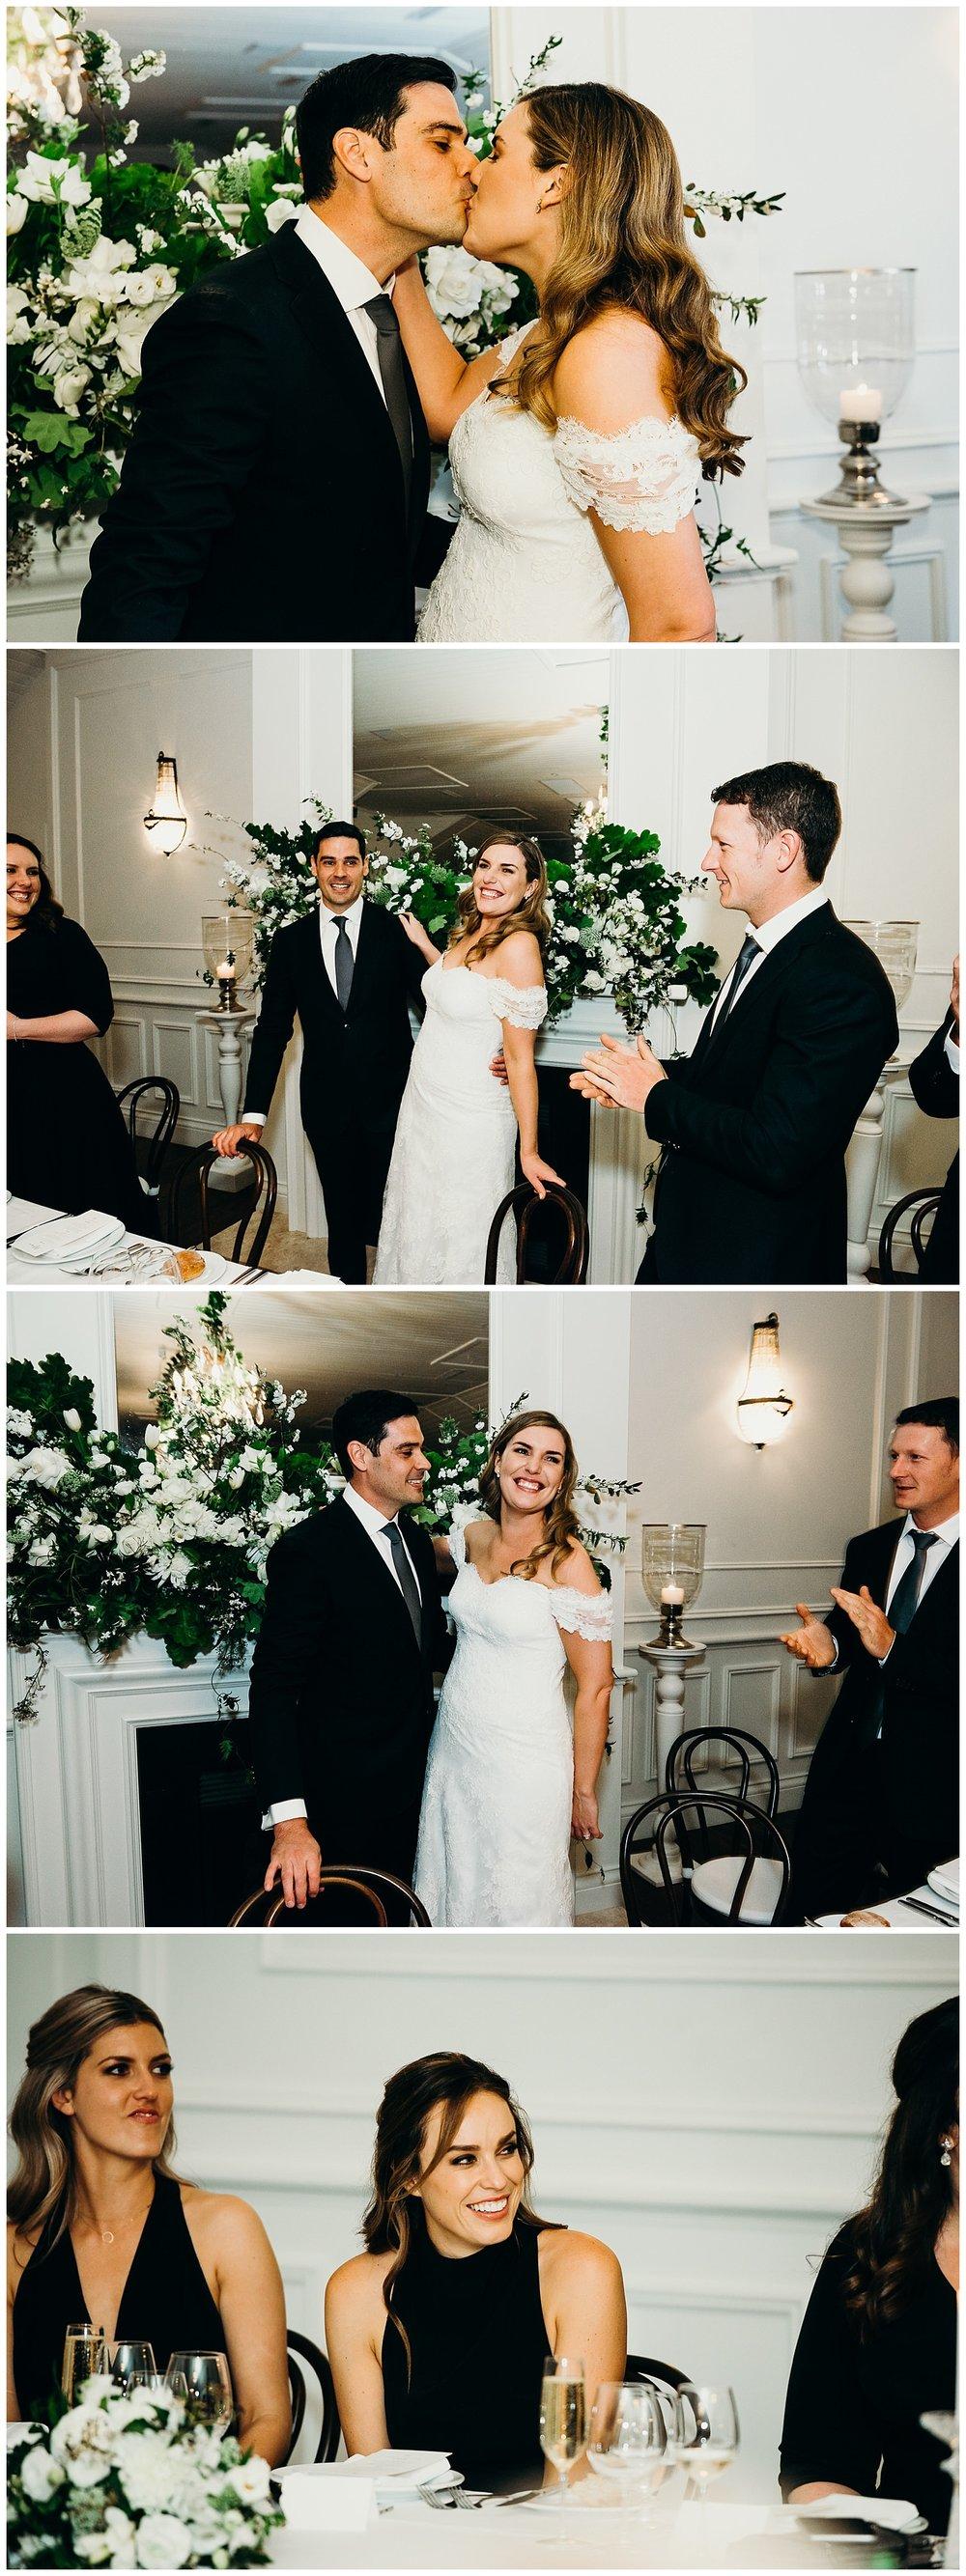 Zoe McMahon Photographer - Hopewood House - Wedding Day Photography - Georgie and David - Collage 30.jpg